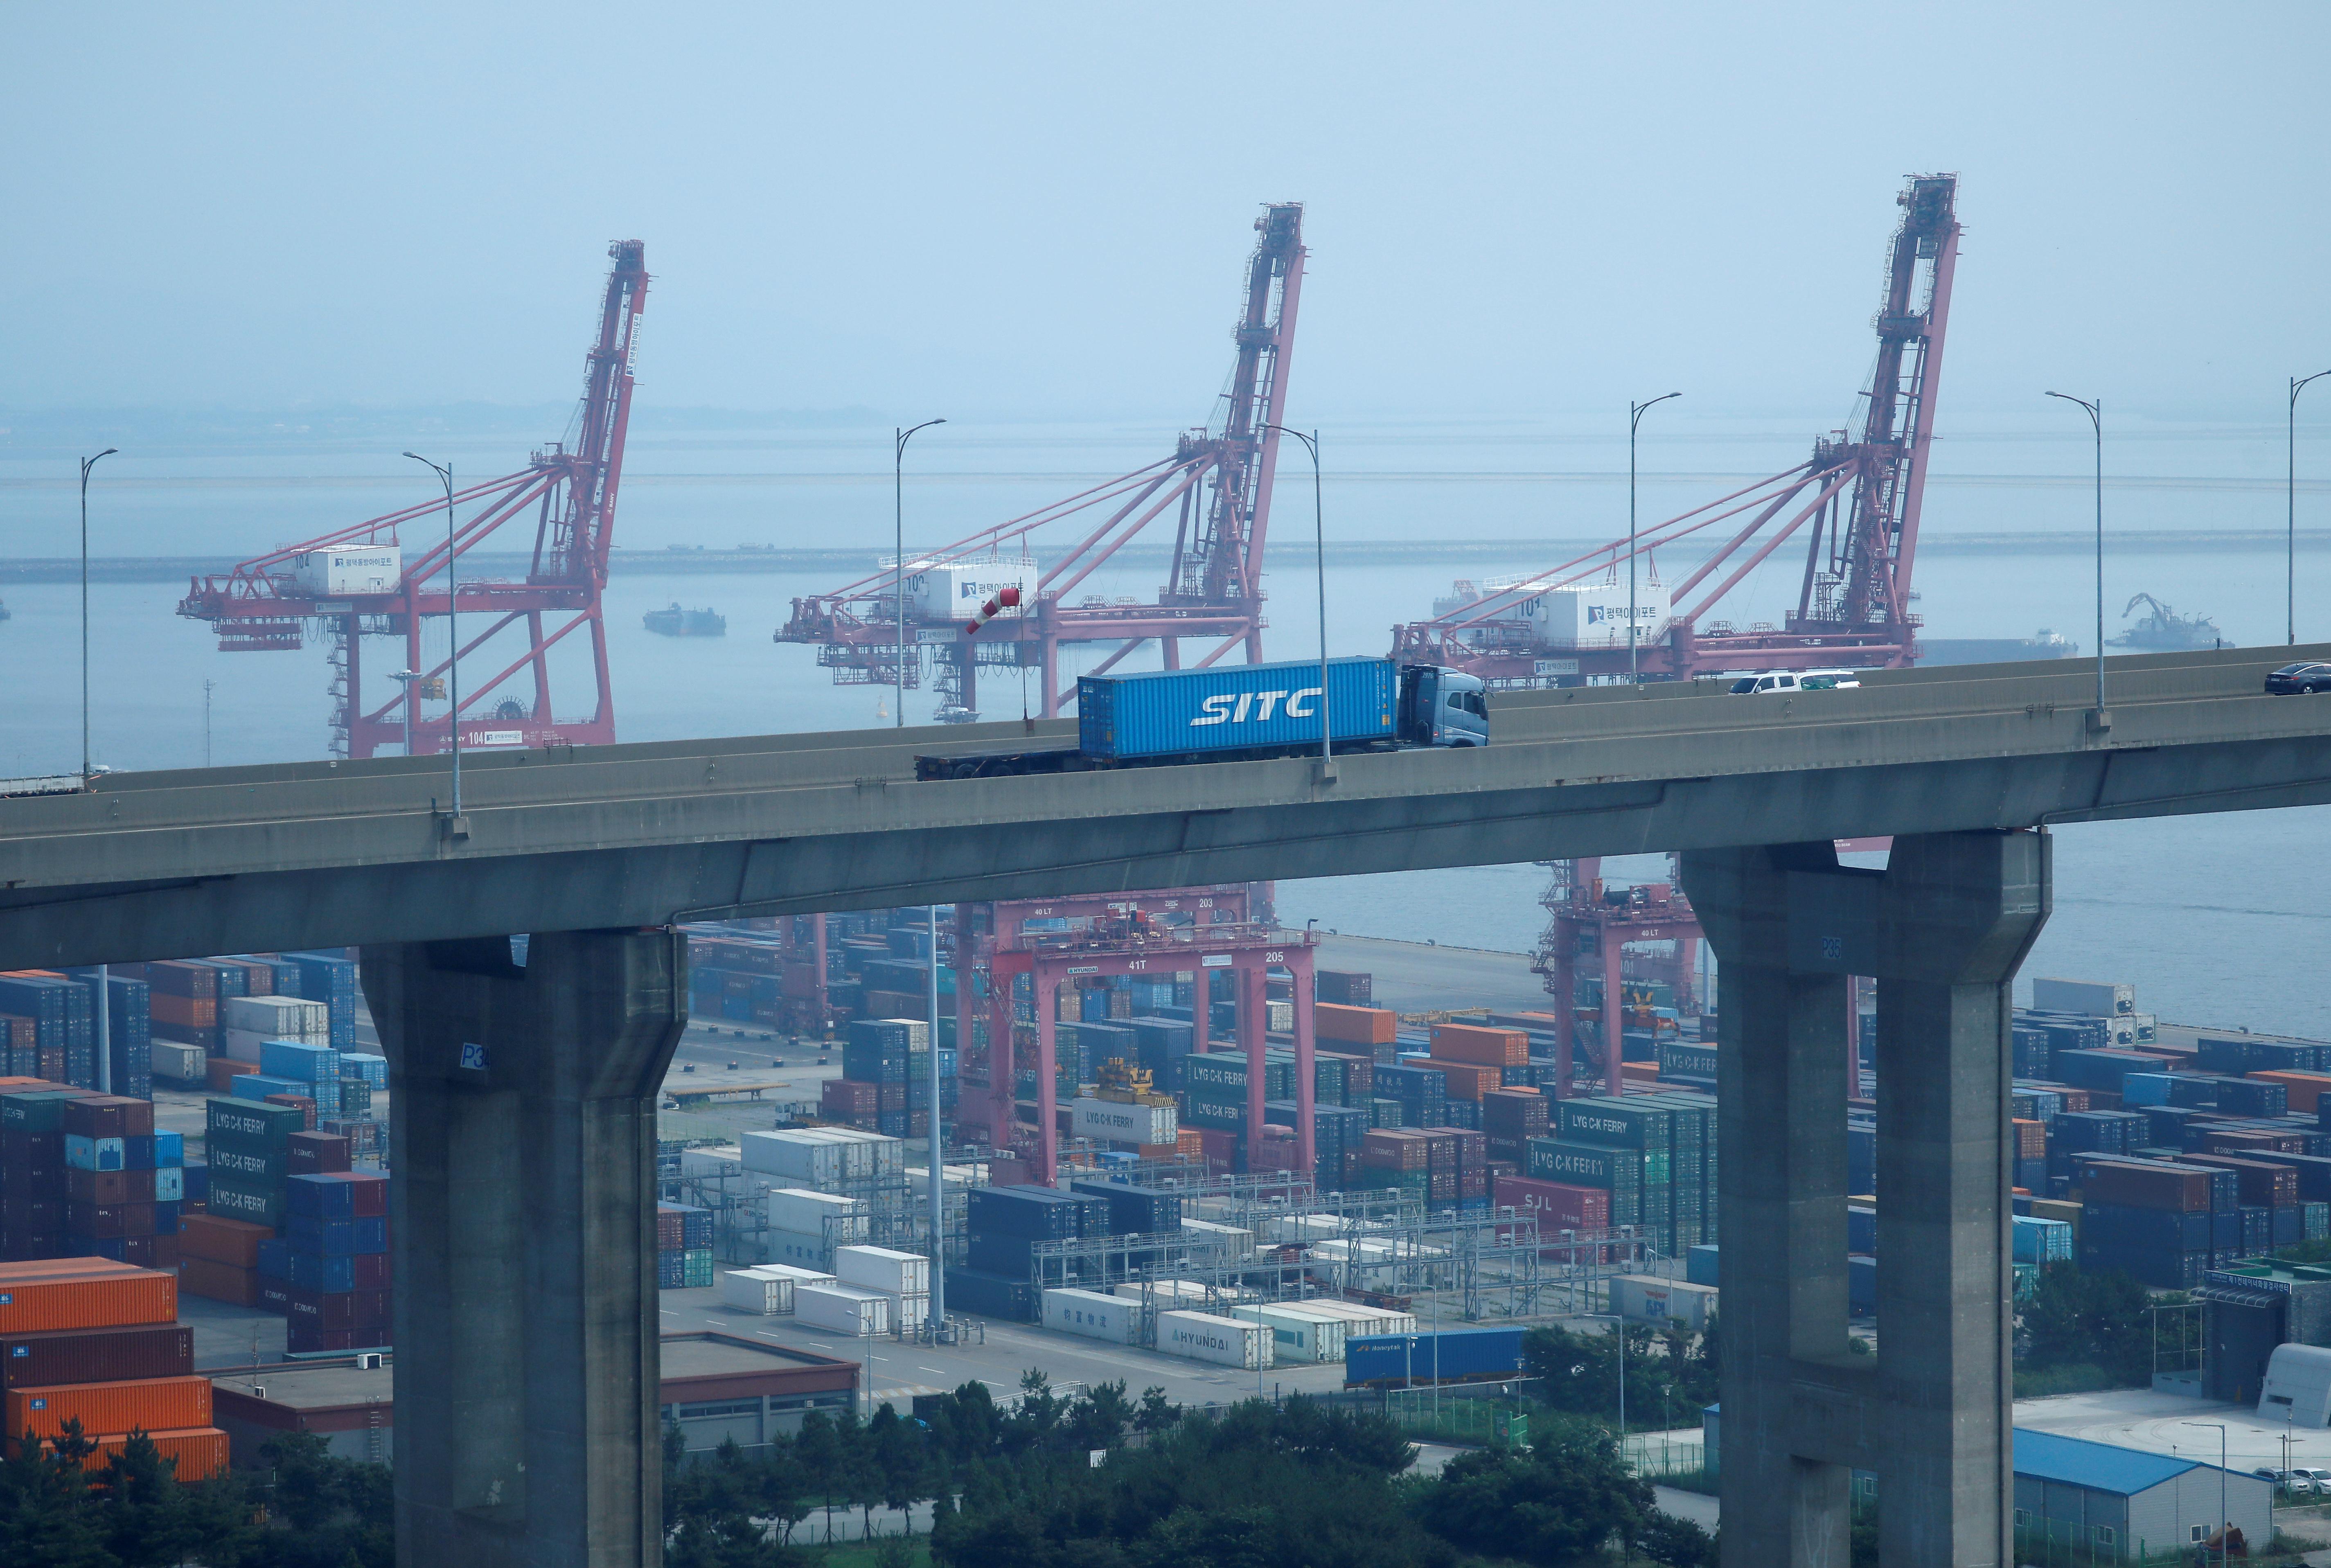 A truck carrying a shipping container travels past cranes at Pyeongtaek port in Pyeongtaek, South Korea, July 9, 2020.    REUTERS/Kim Hong-Ji